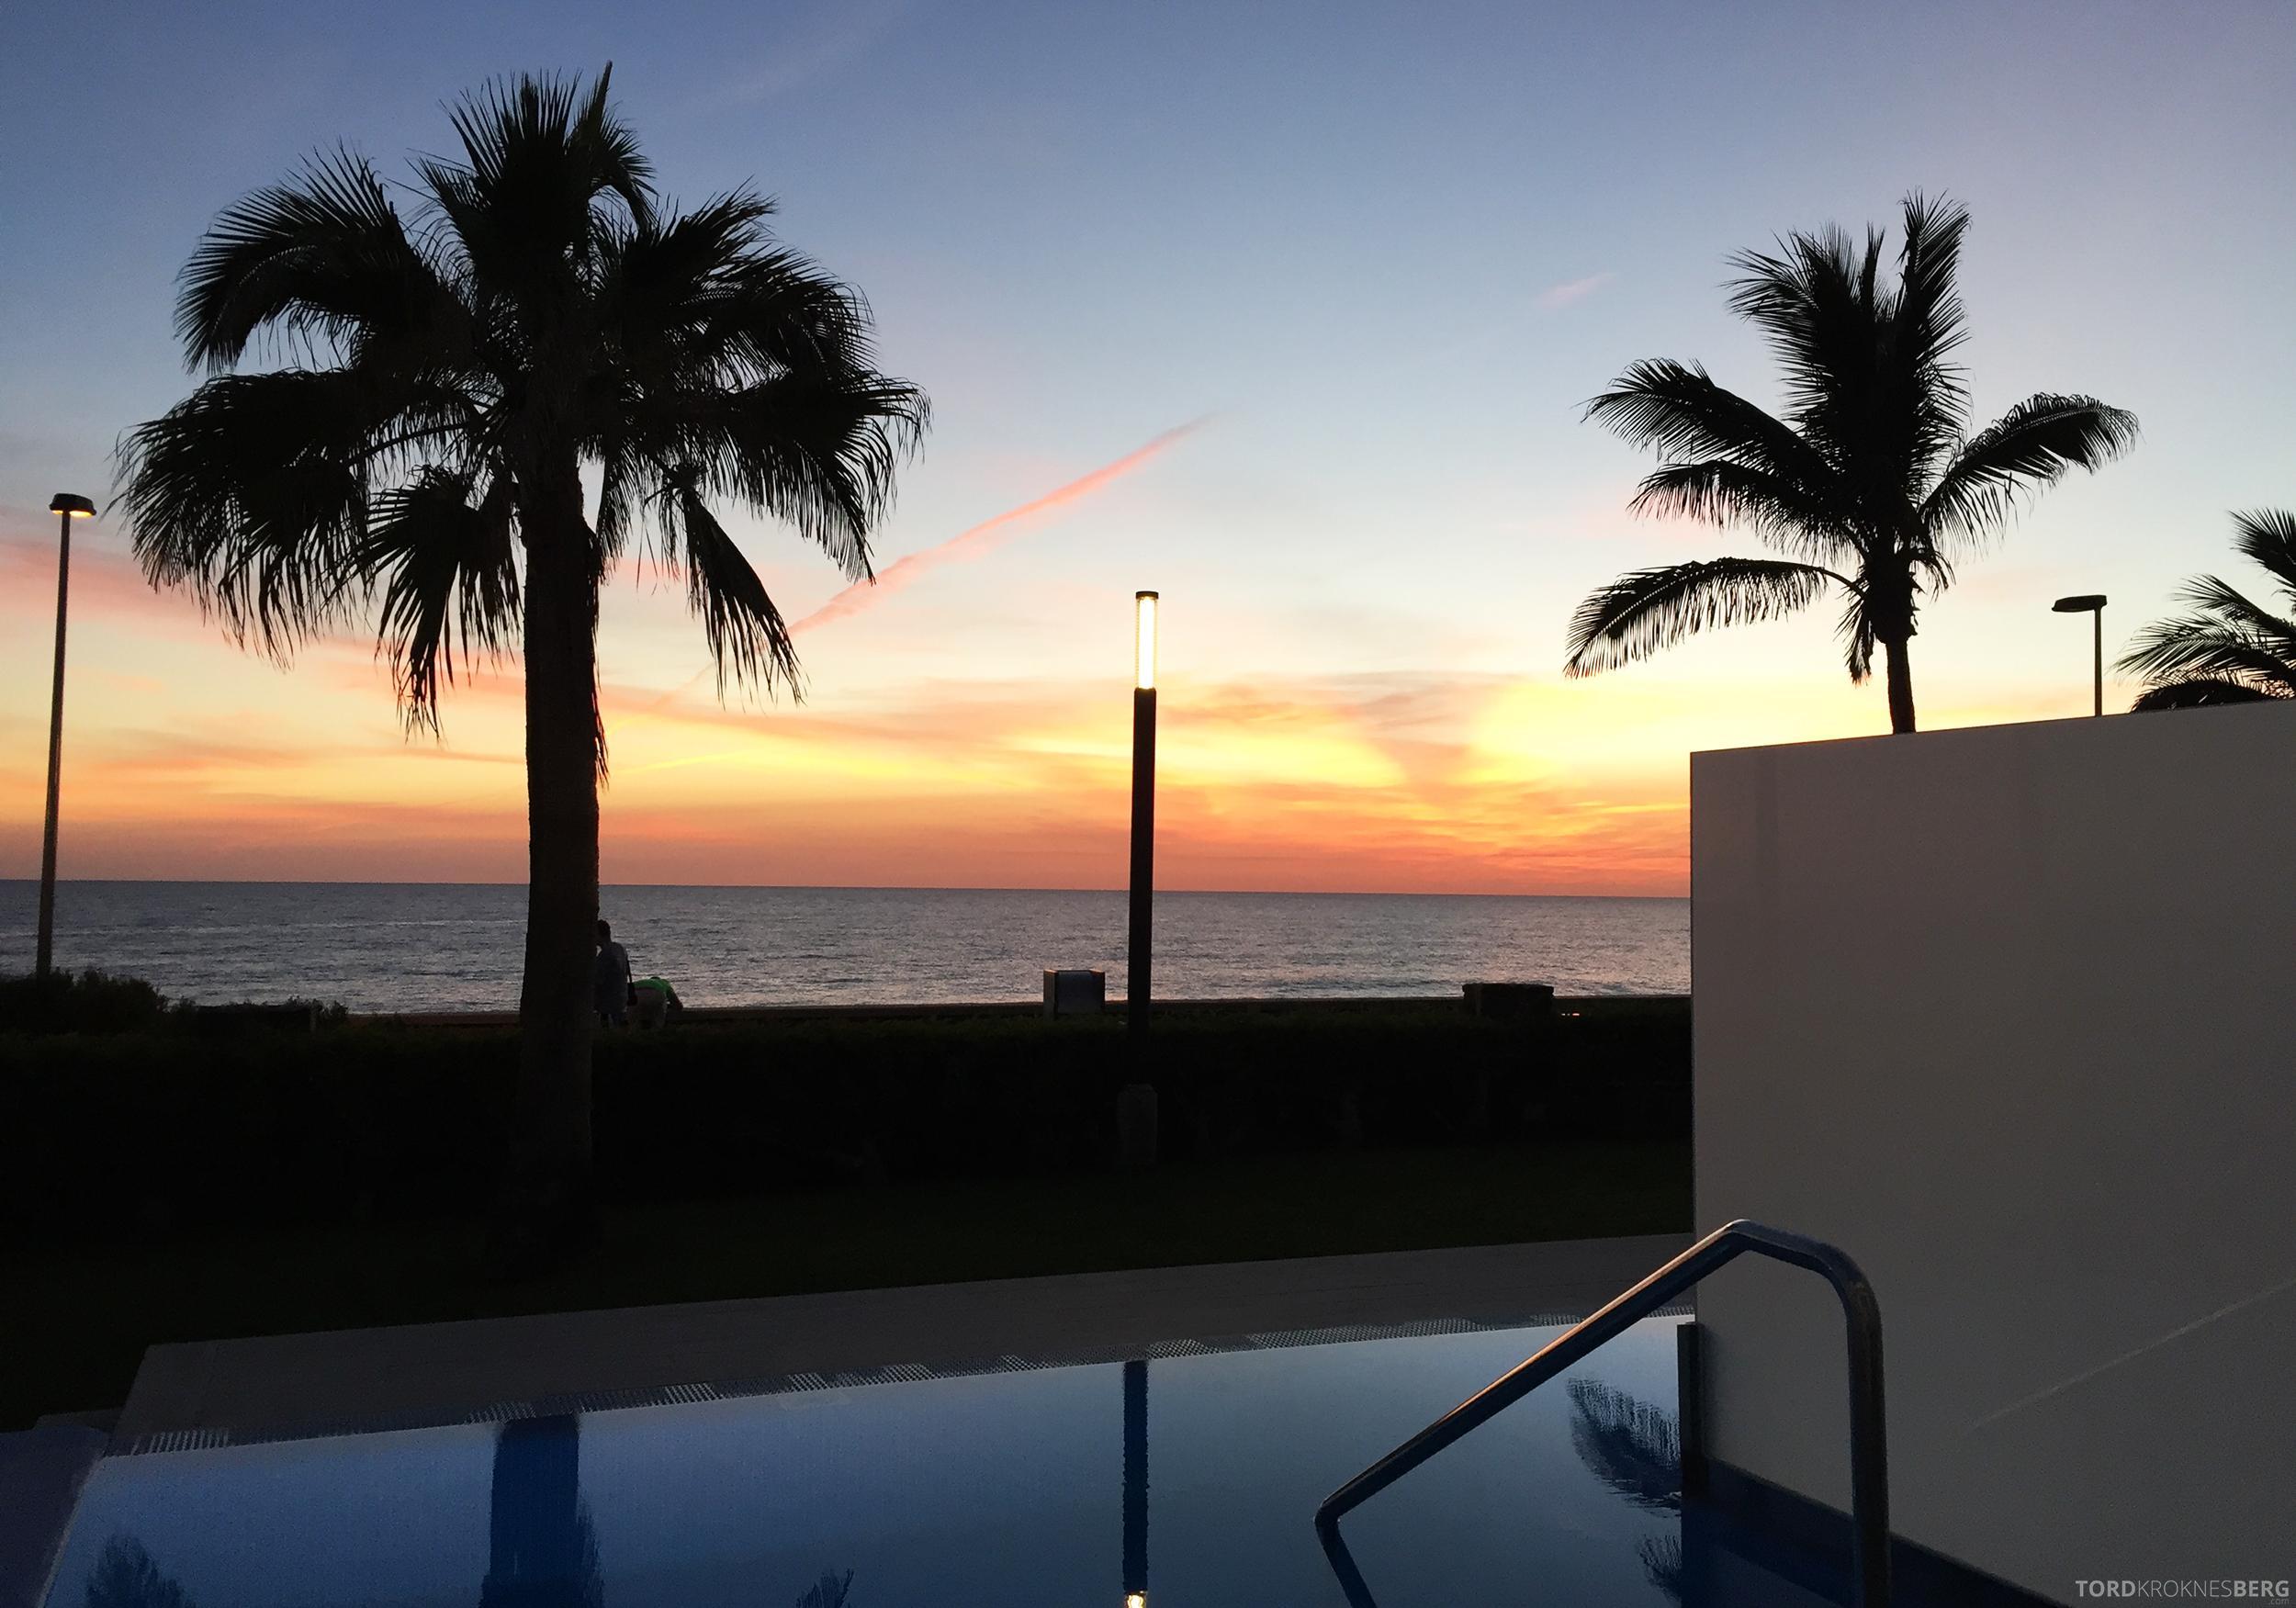 ClubHotel RIU Gran Canaria solnedgang